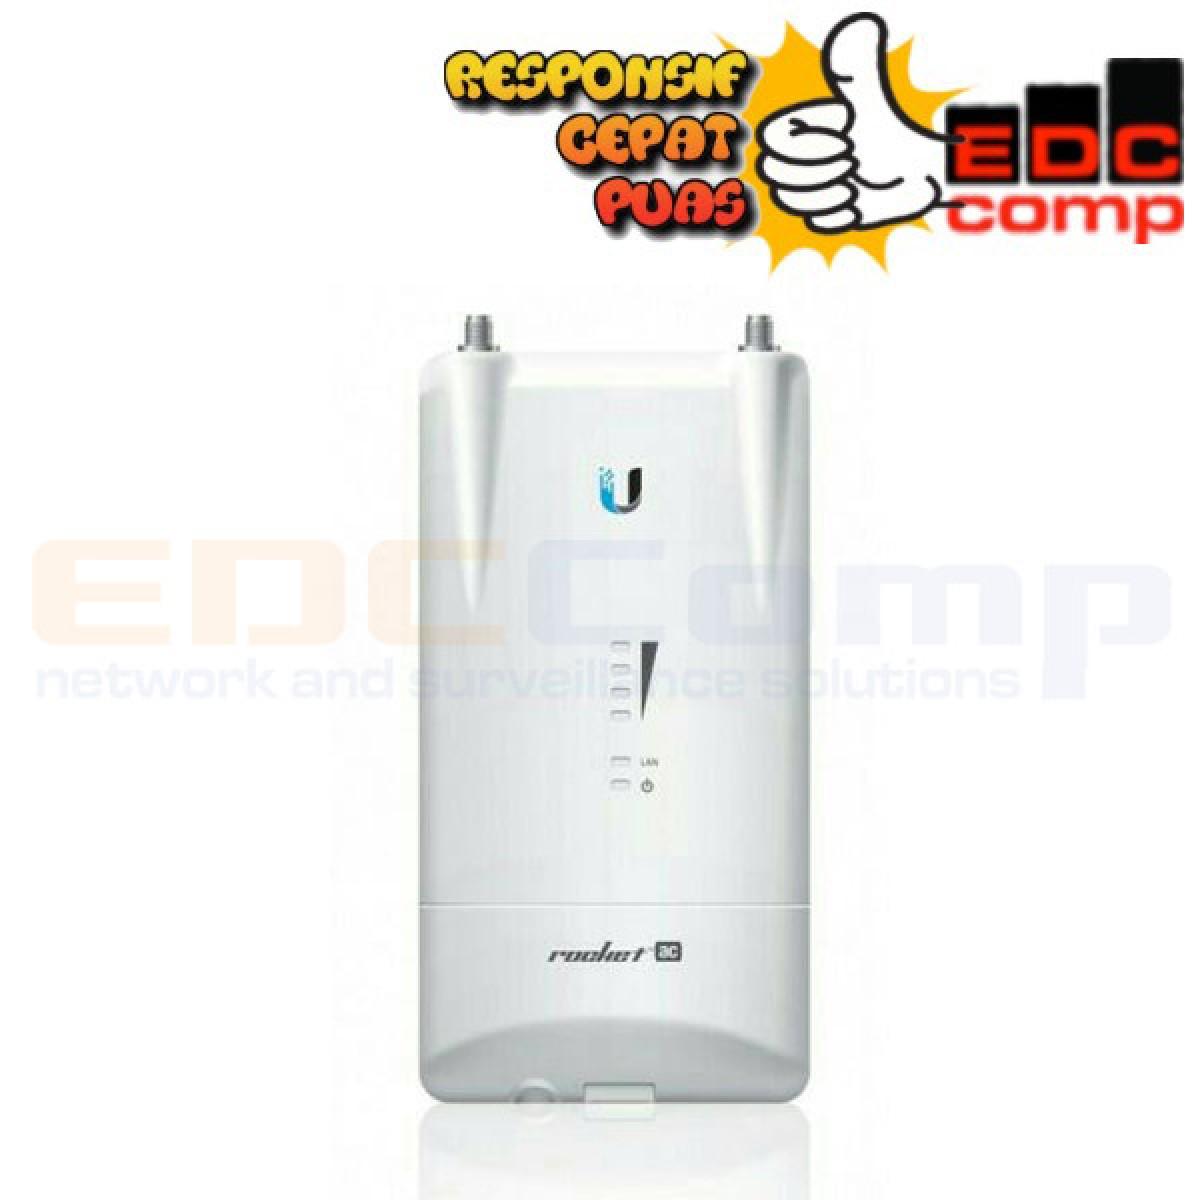 Ubiquiti Rocket 5 AC Lite / Ubnt Rocket5-AC / RM5-AC-Lite / R5 AC - EdcComp